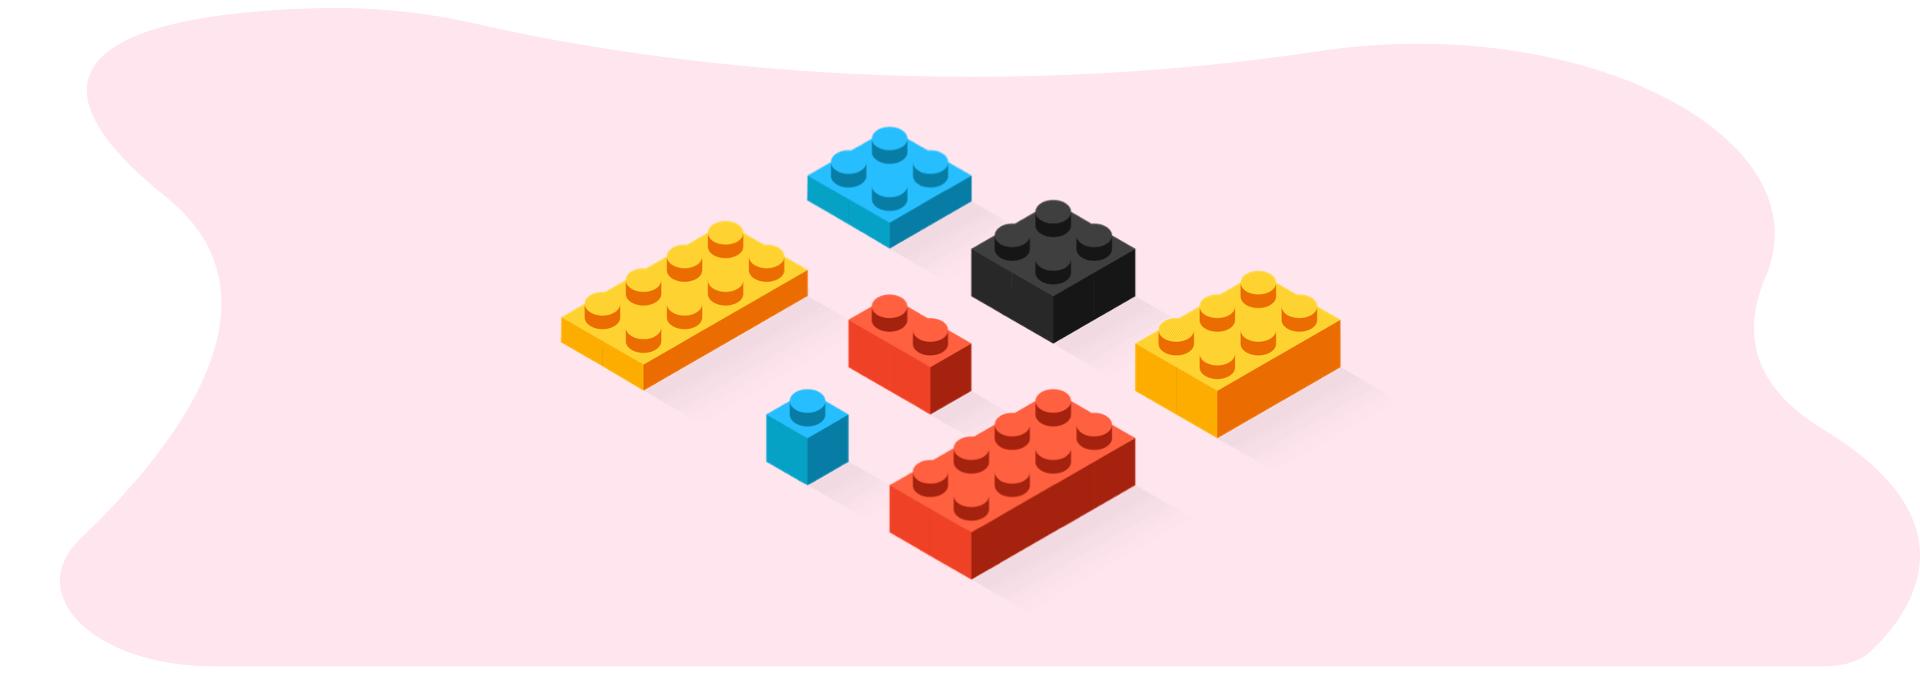 Sideways 6 - Examples of Intrapreneurship - LEGOLAND (1)